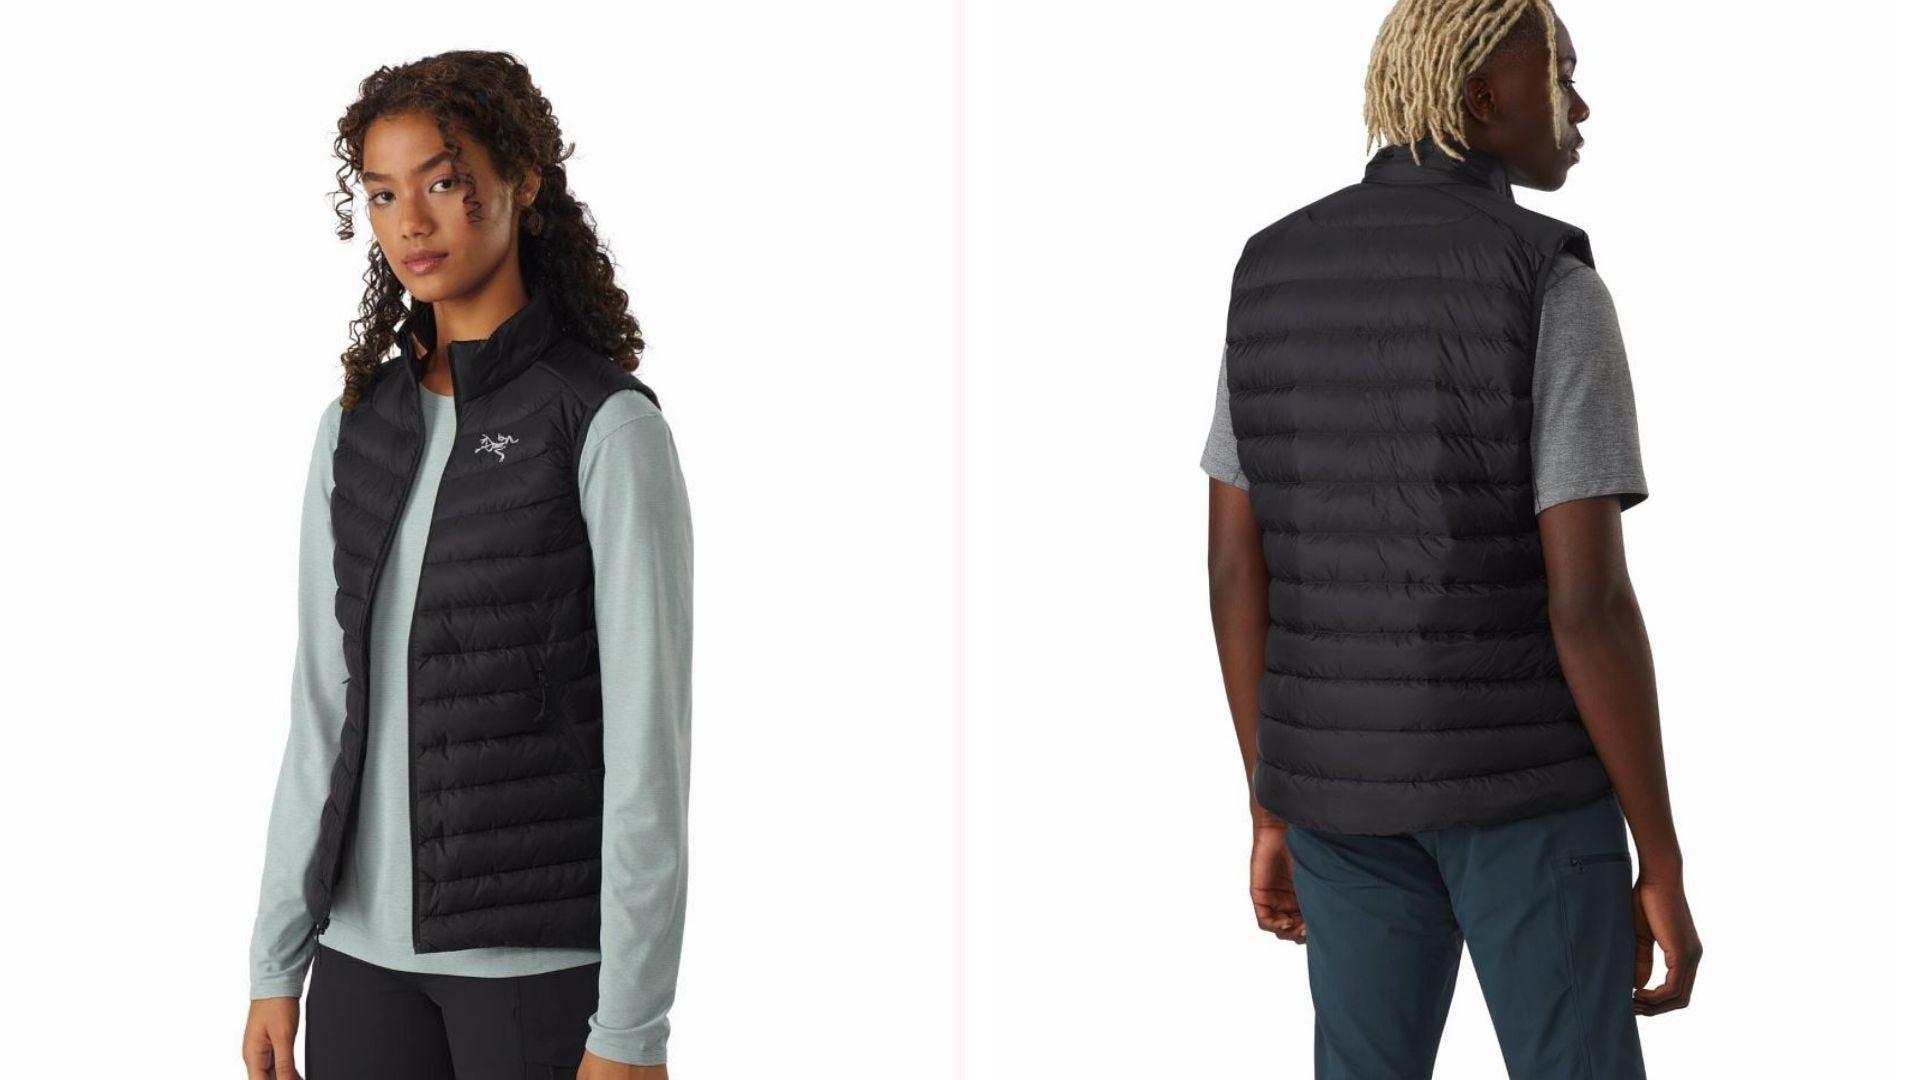 A man and woman wearing the black Cerium LT Vest.